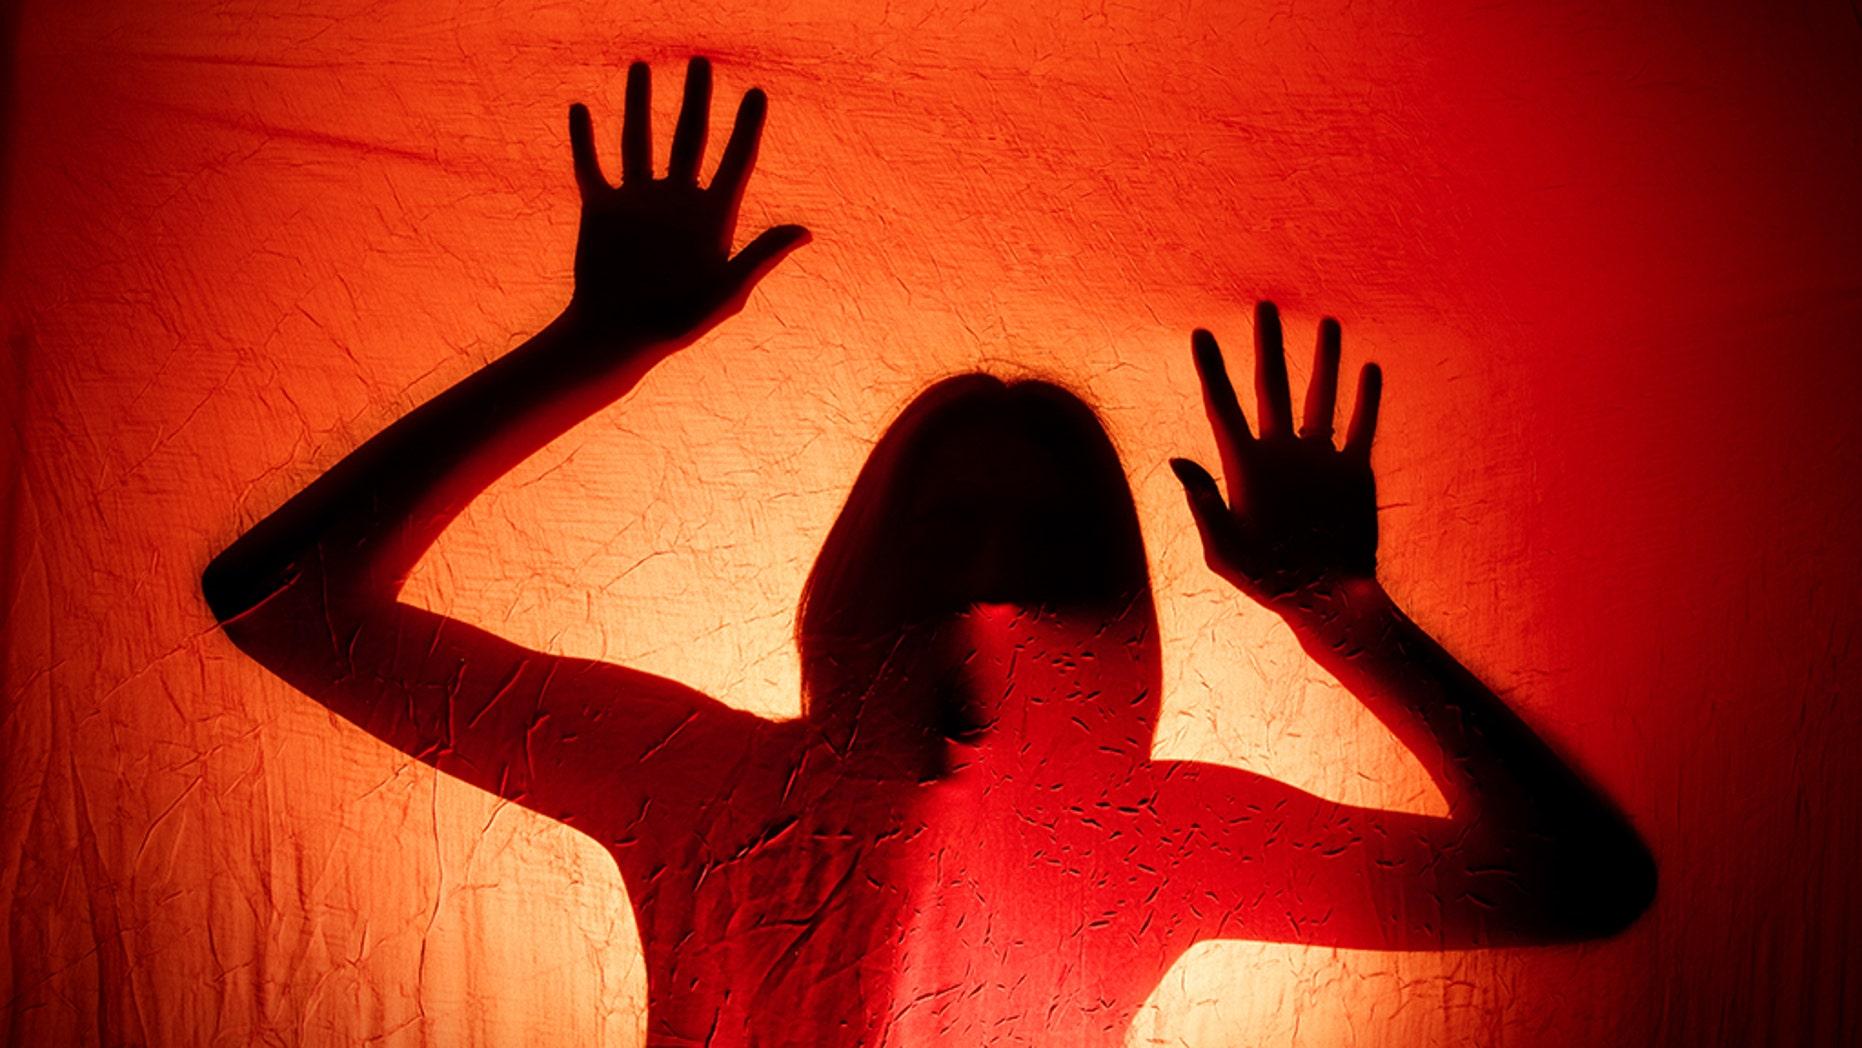 Ohio haunted house slammed for performing alleged 'mock rape